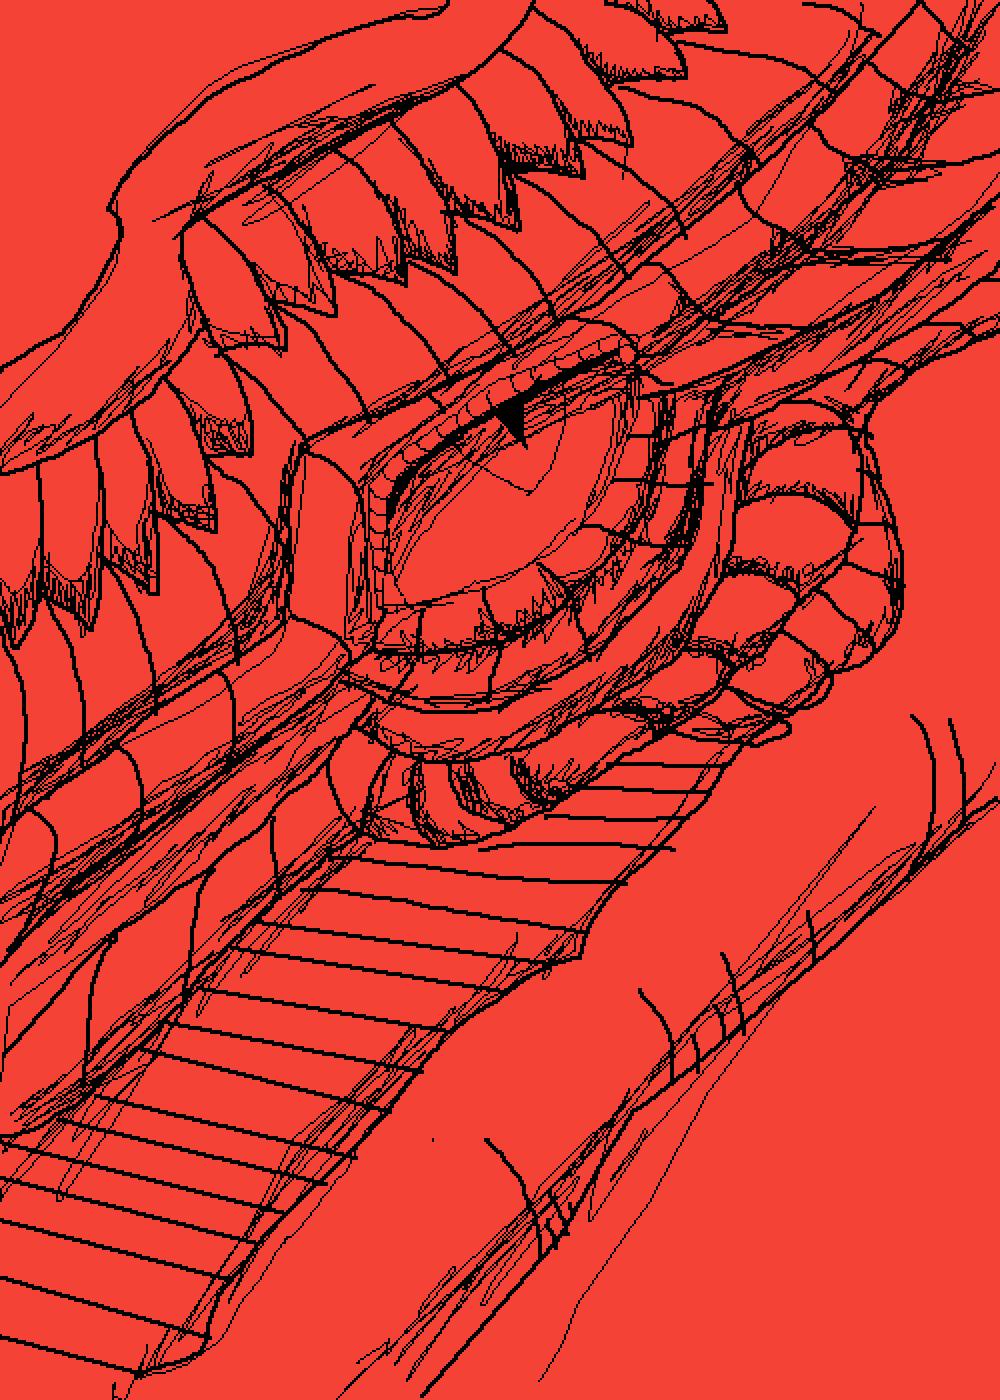 main-image-2 color dragon  by ColorBlitz98